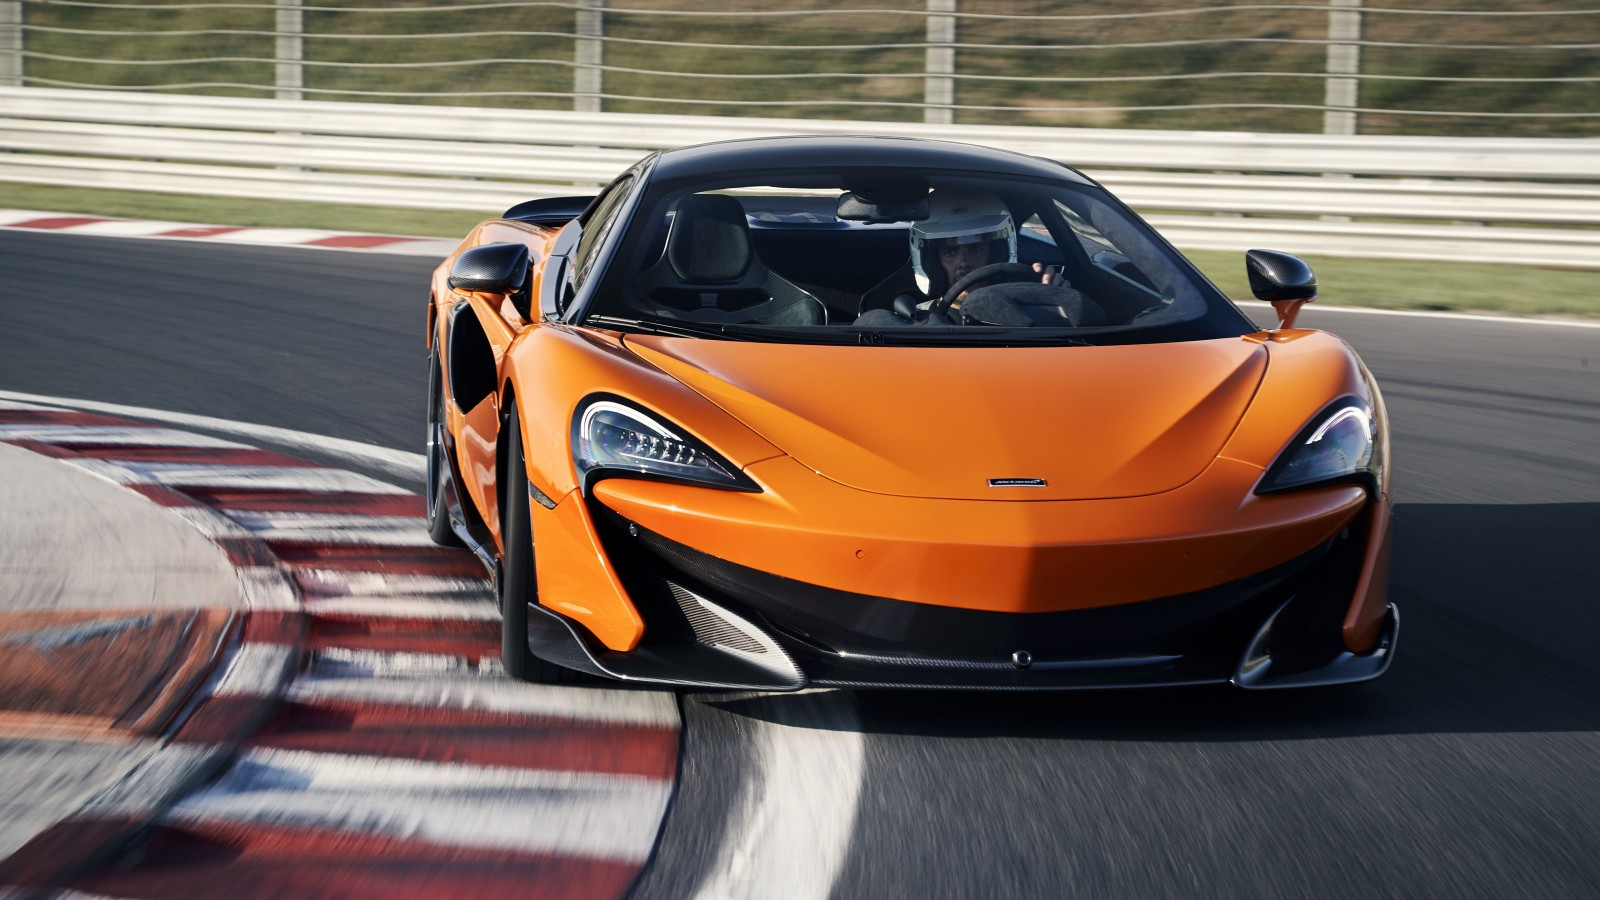 BMW Race Car >> McLaren 600LT on Race track 5K Wallpaper | HD Car ...